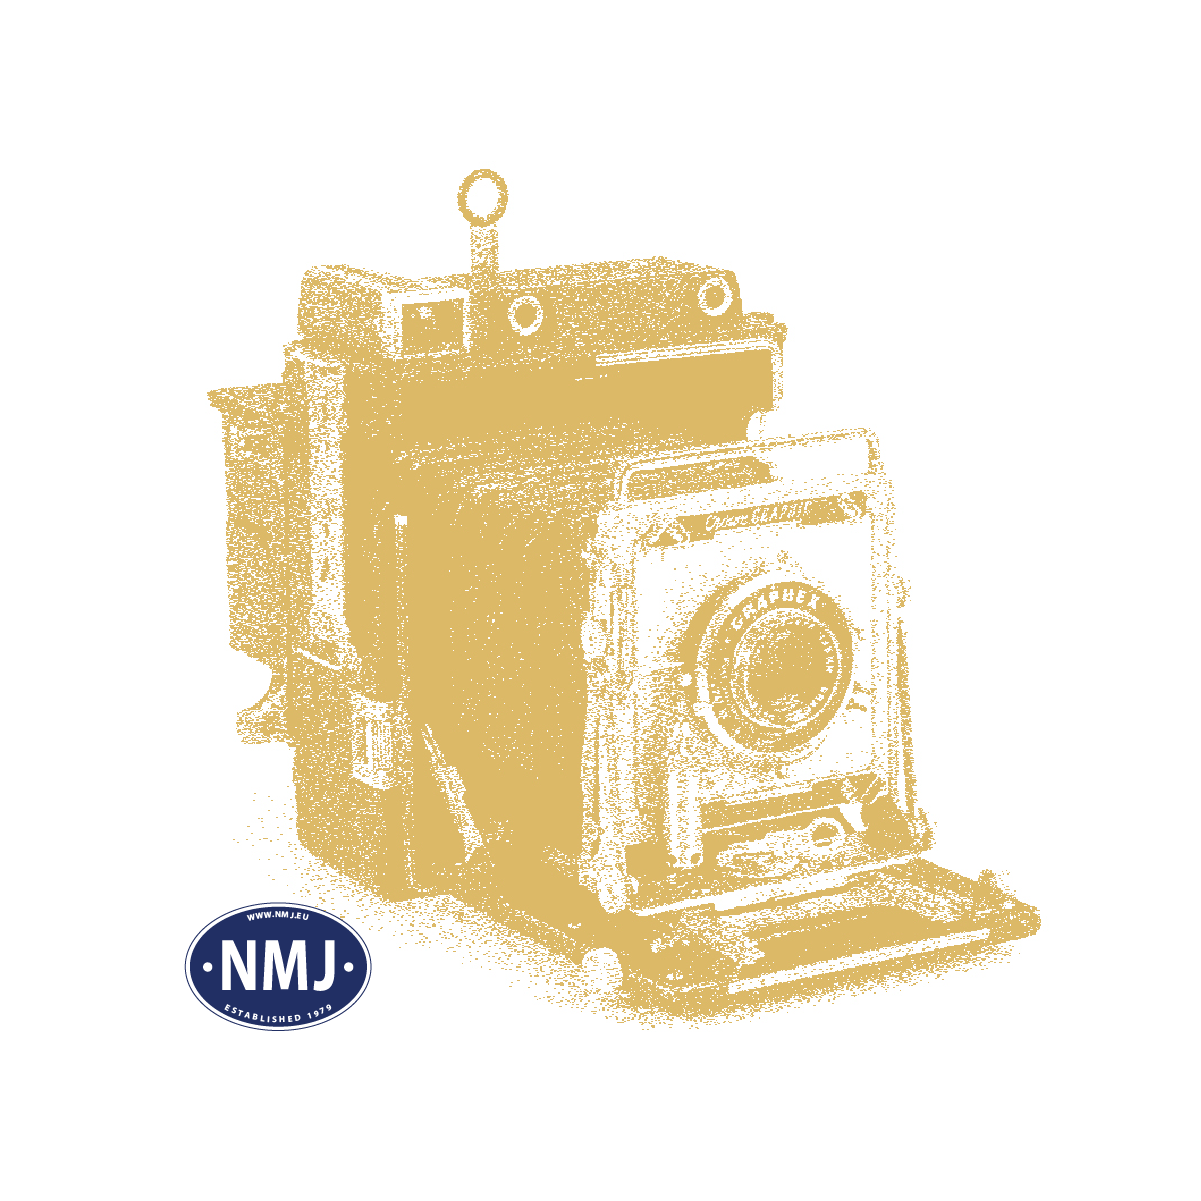 NMJT505.990 - NMJ Topline NSB/Finsam Fliscontainer, 3 Stk